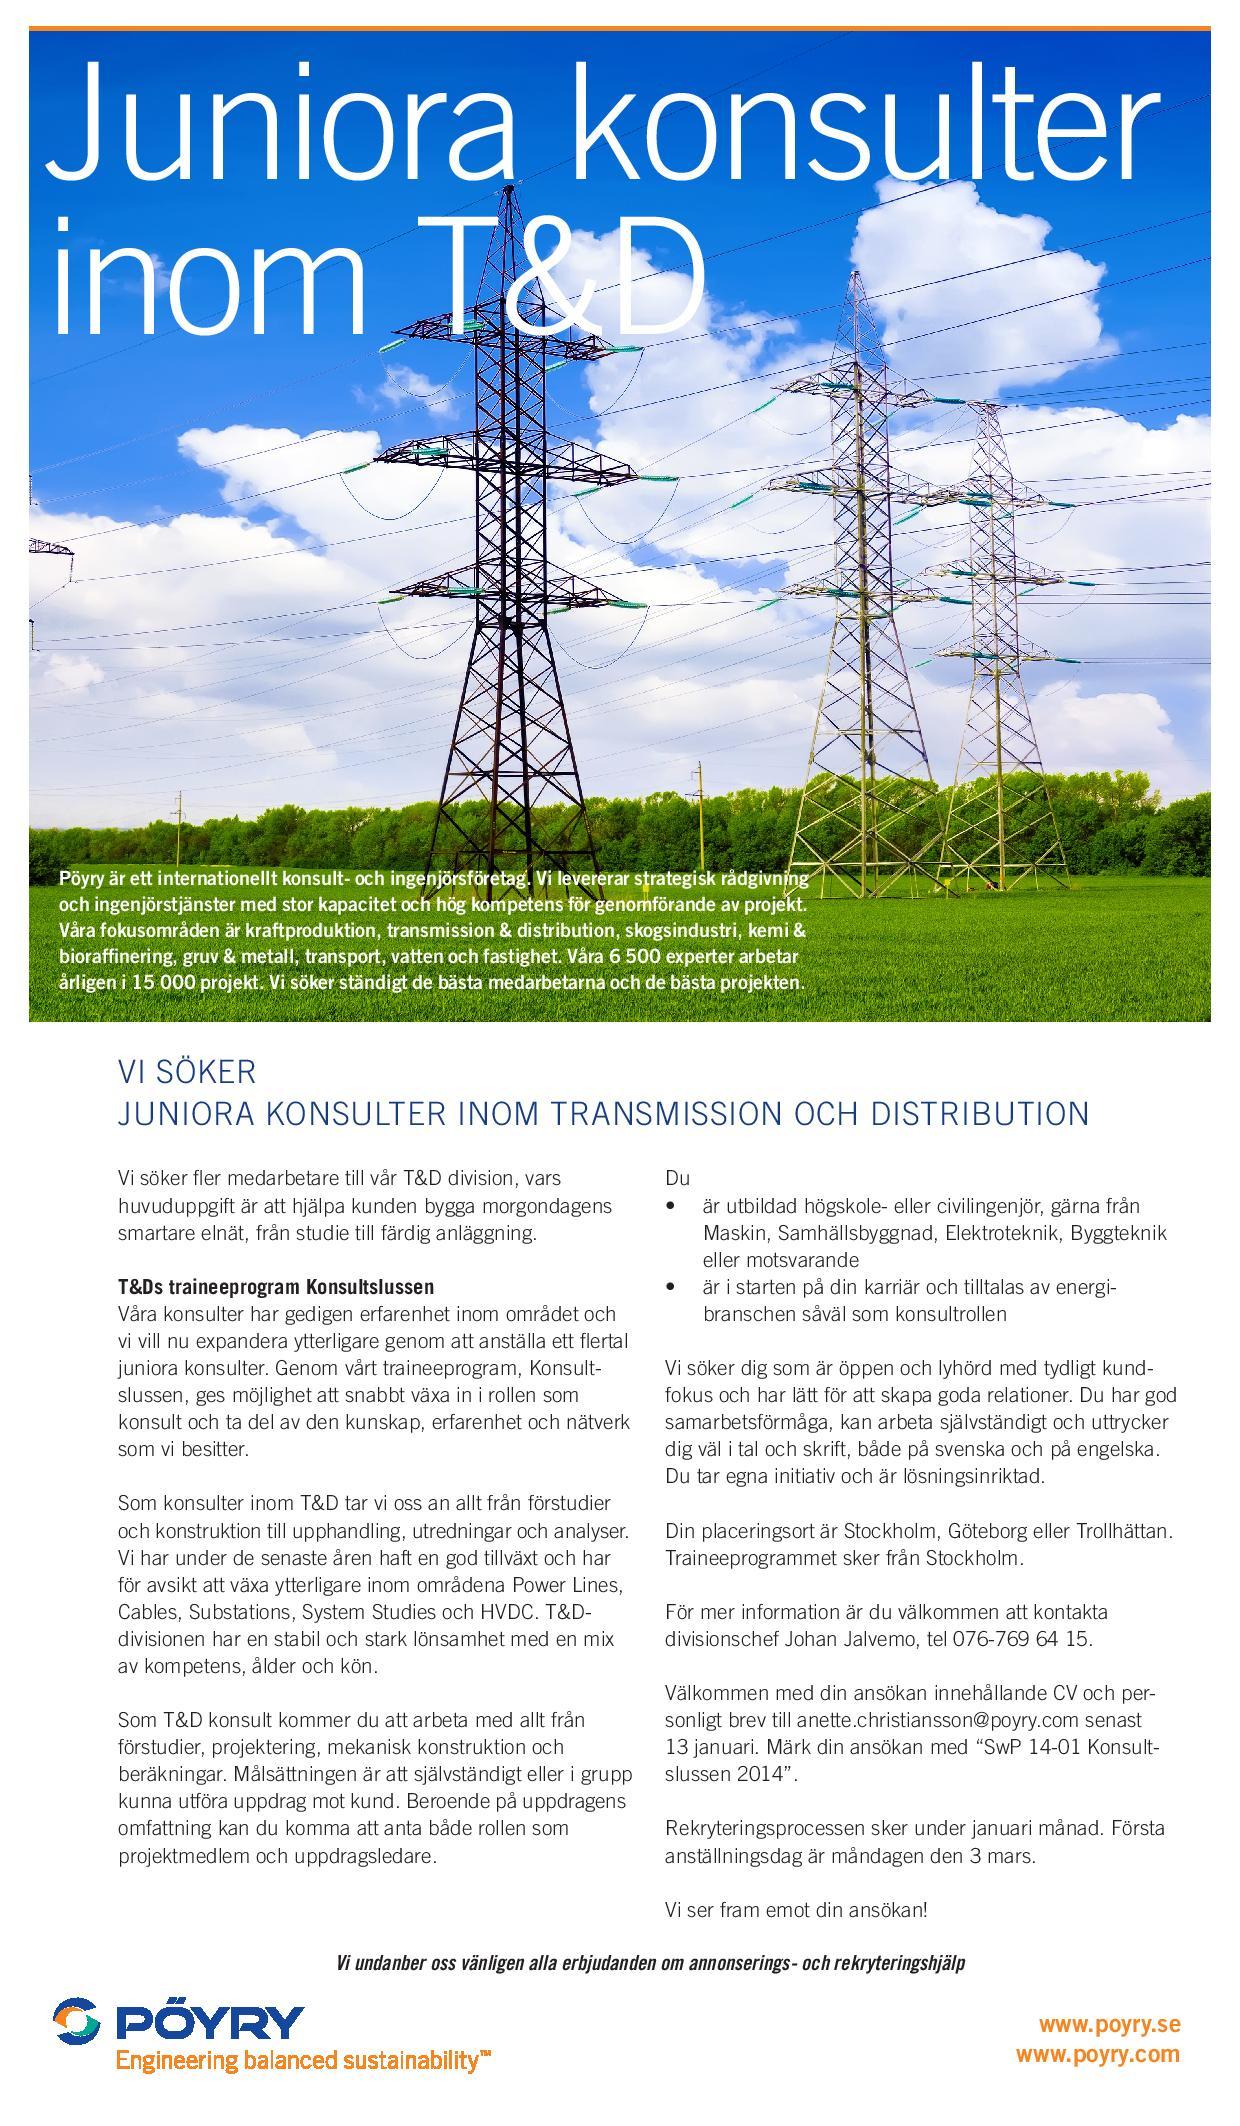 swp_14-01_konsultslussen_2014_1312-1-page-001